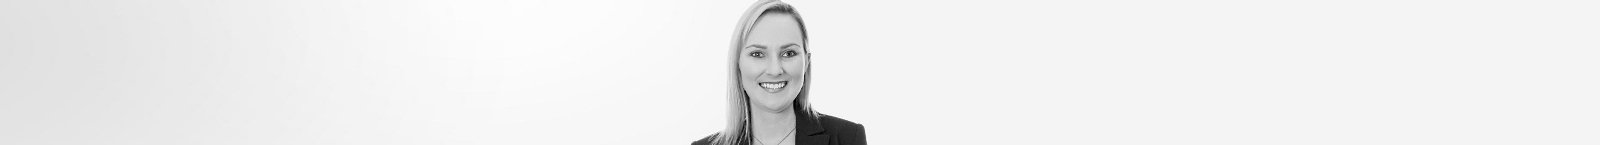 Strathpine Branch Manager Rachel Gordon | Shine Lawyers